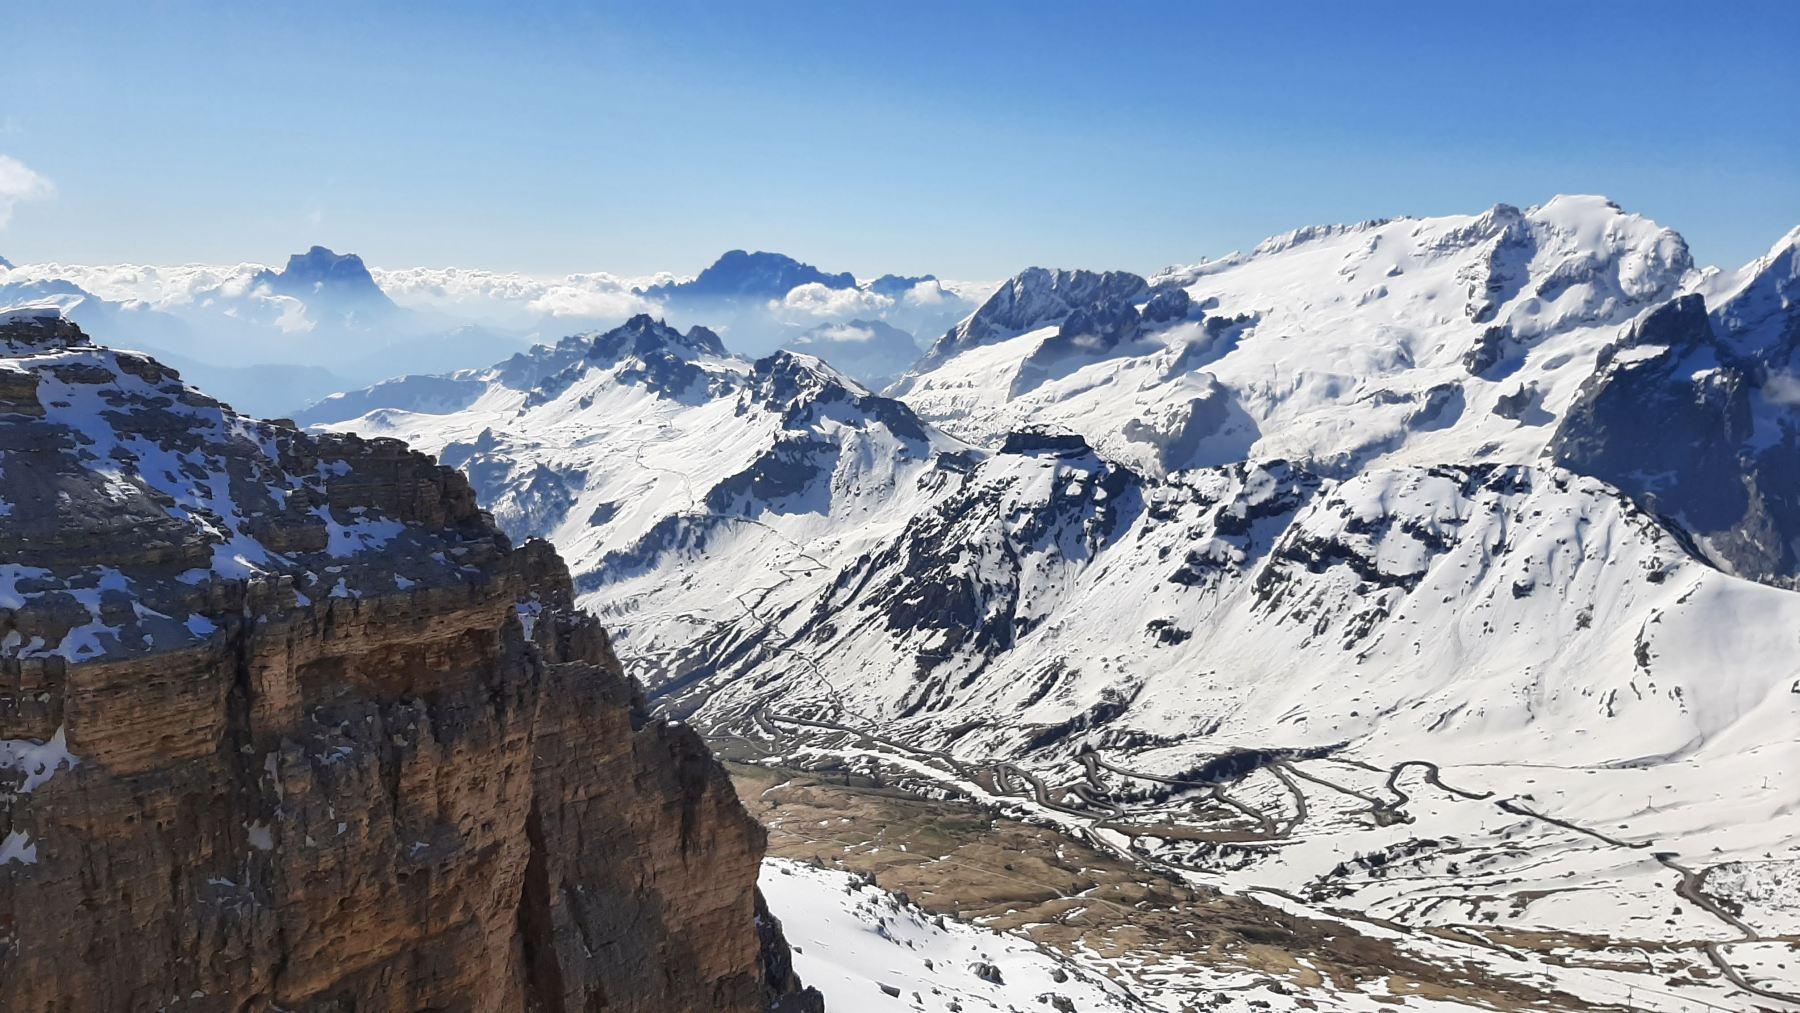 Pohled ze Sass Pordoi na Passo Pordoi a serpentiny